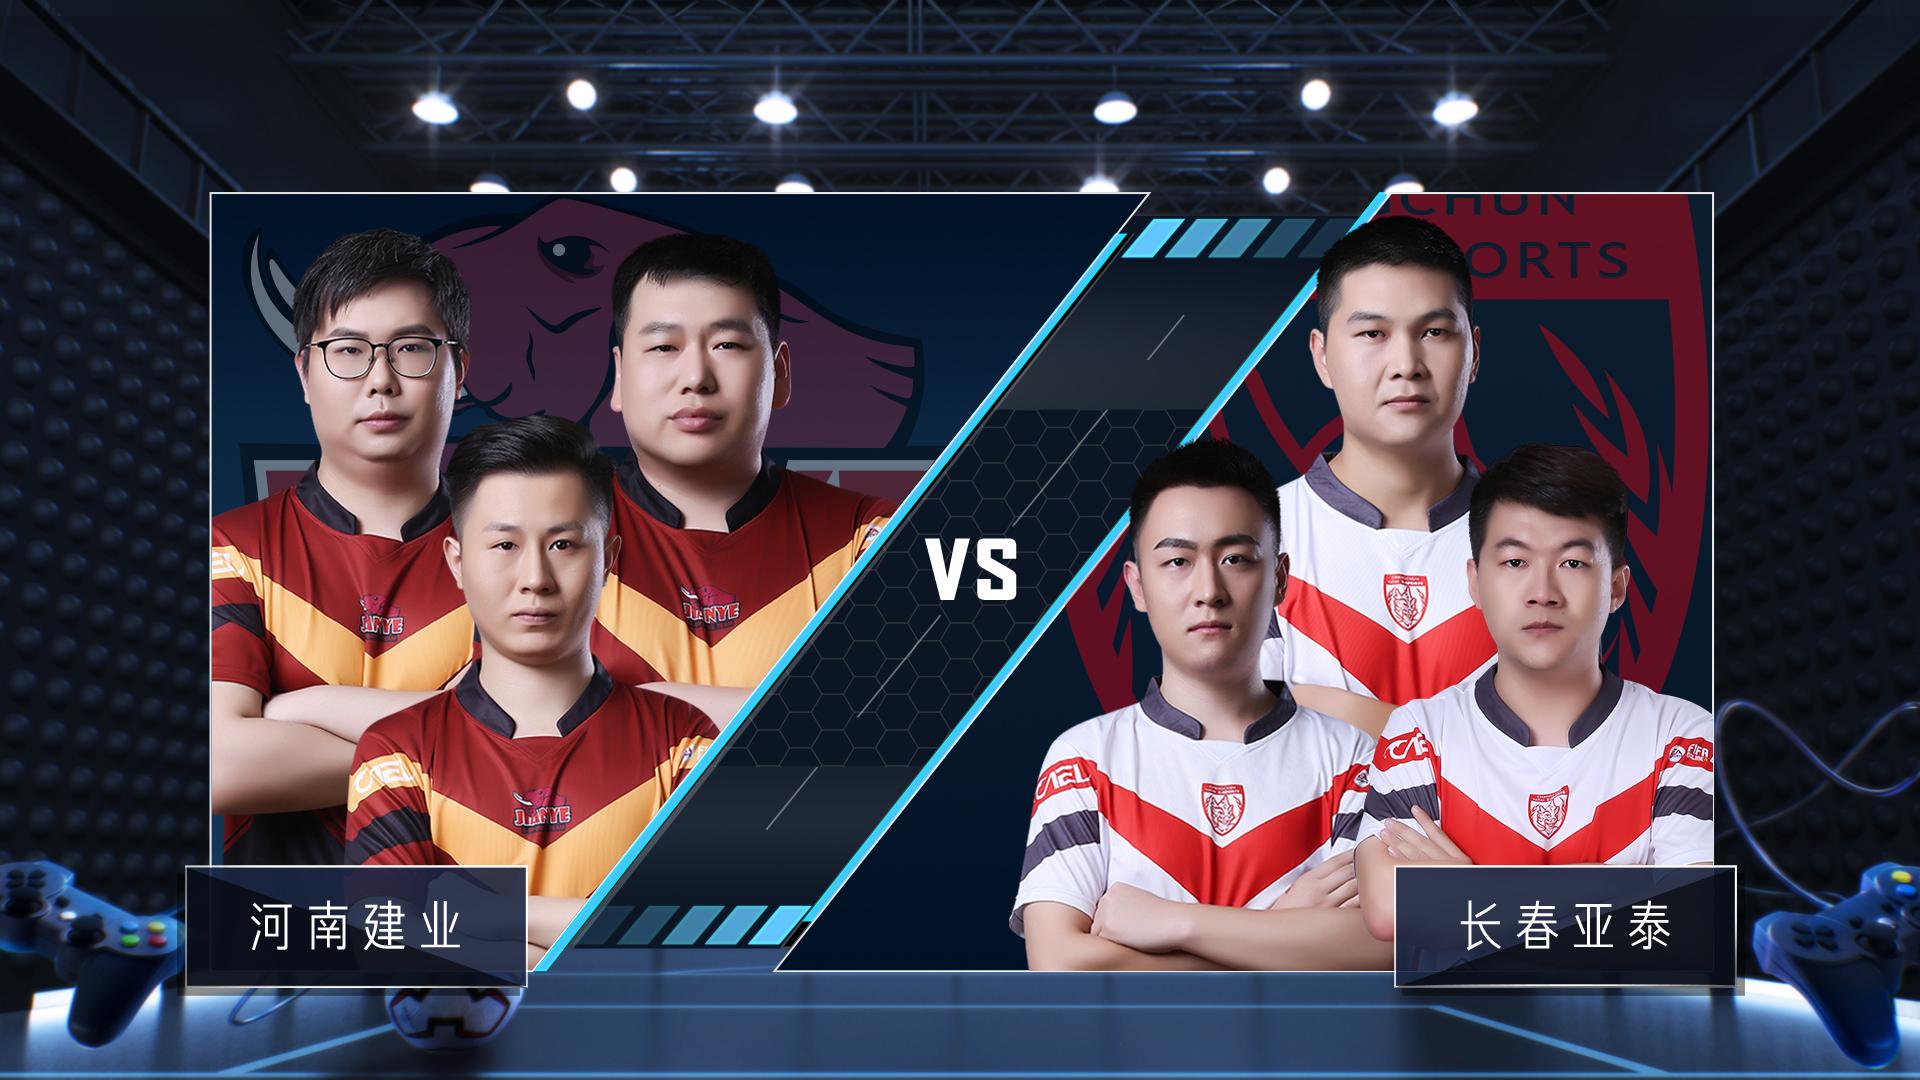 CEFL S3 10月7日 河南建业 vs 长春亚泰